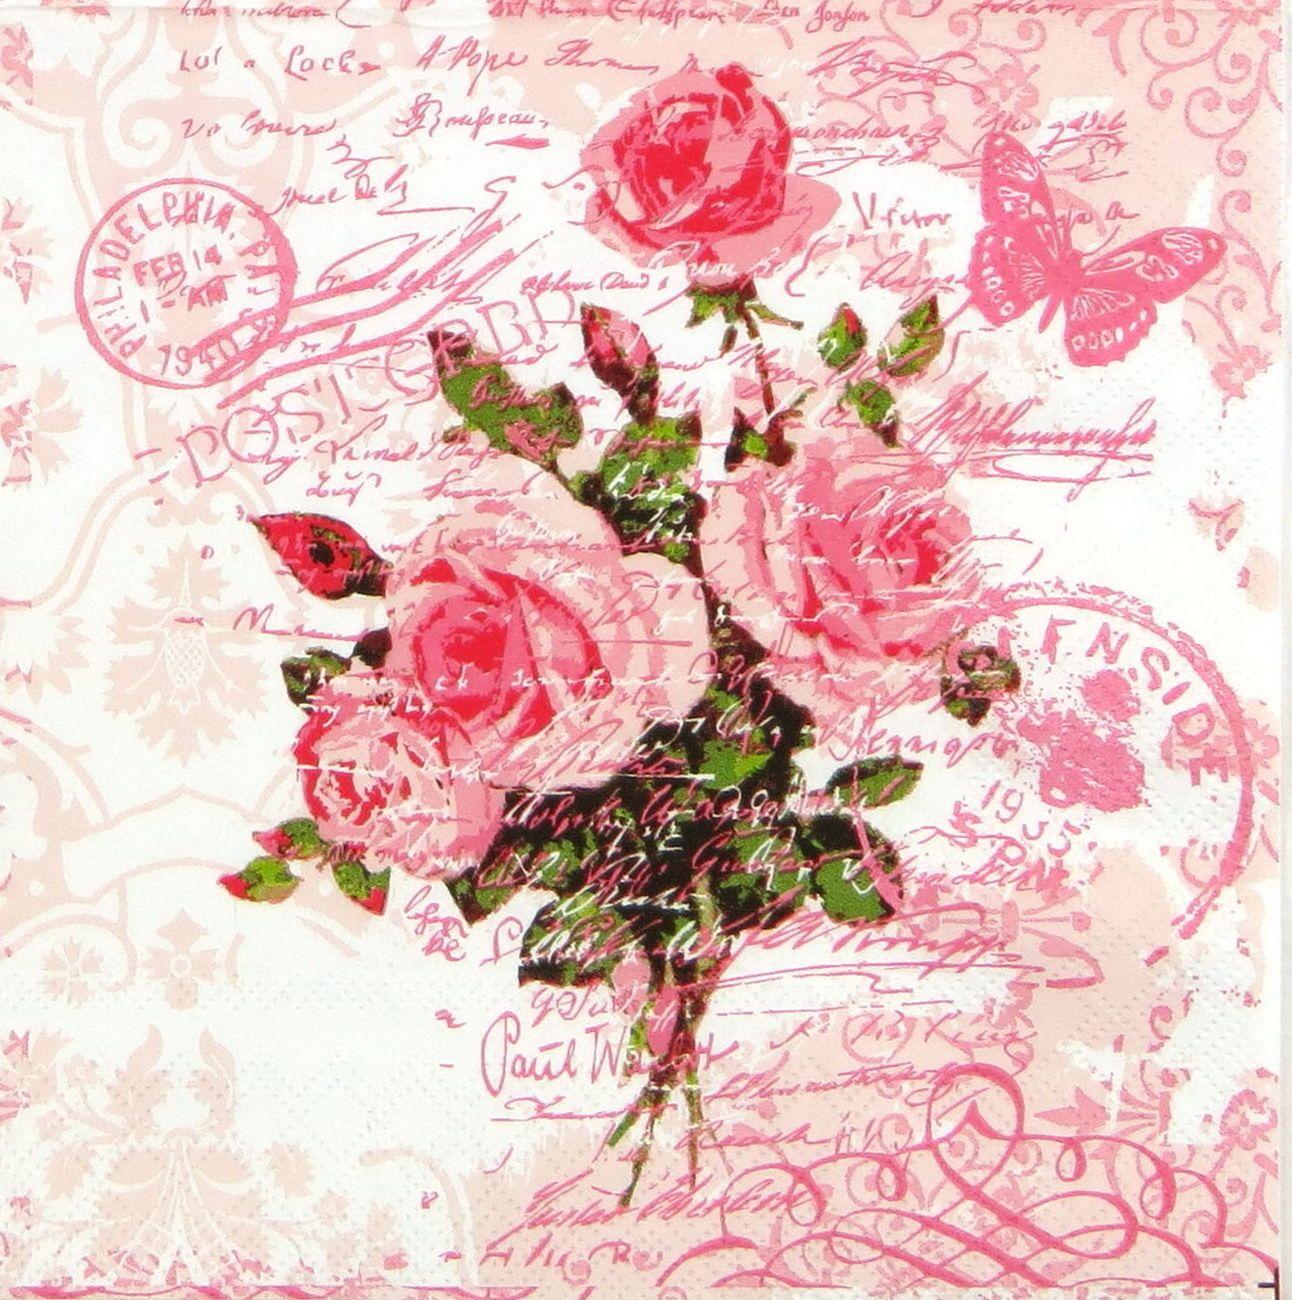 4x Vintage Red Rose Postcard Paper Napkins for Decoupage | Decoupage ...